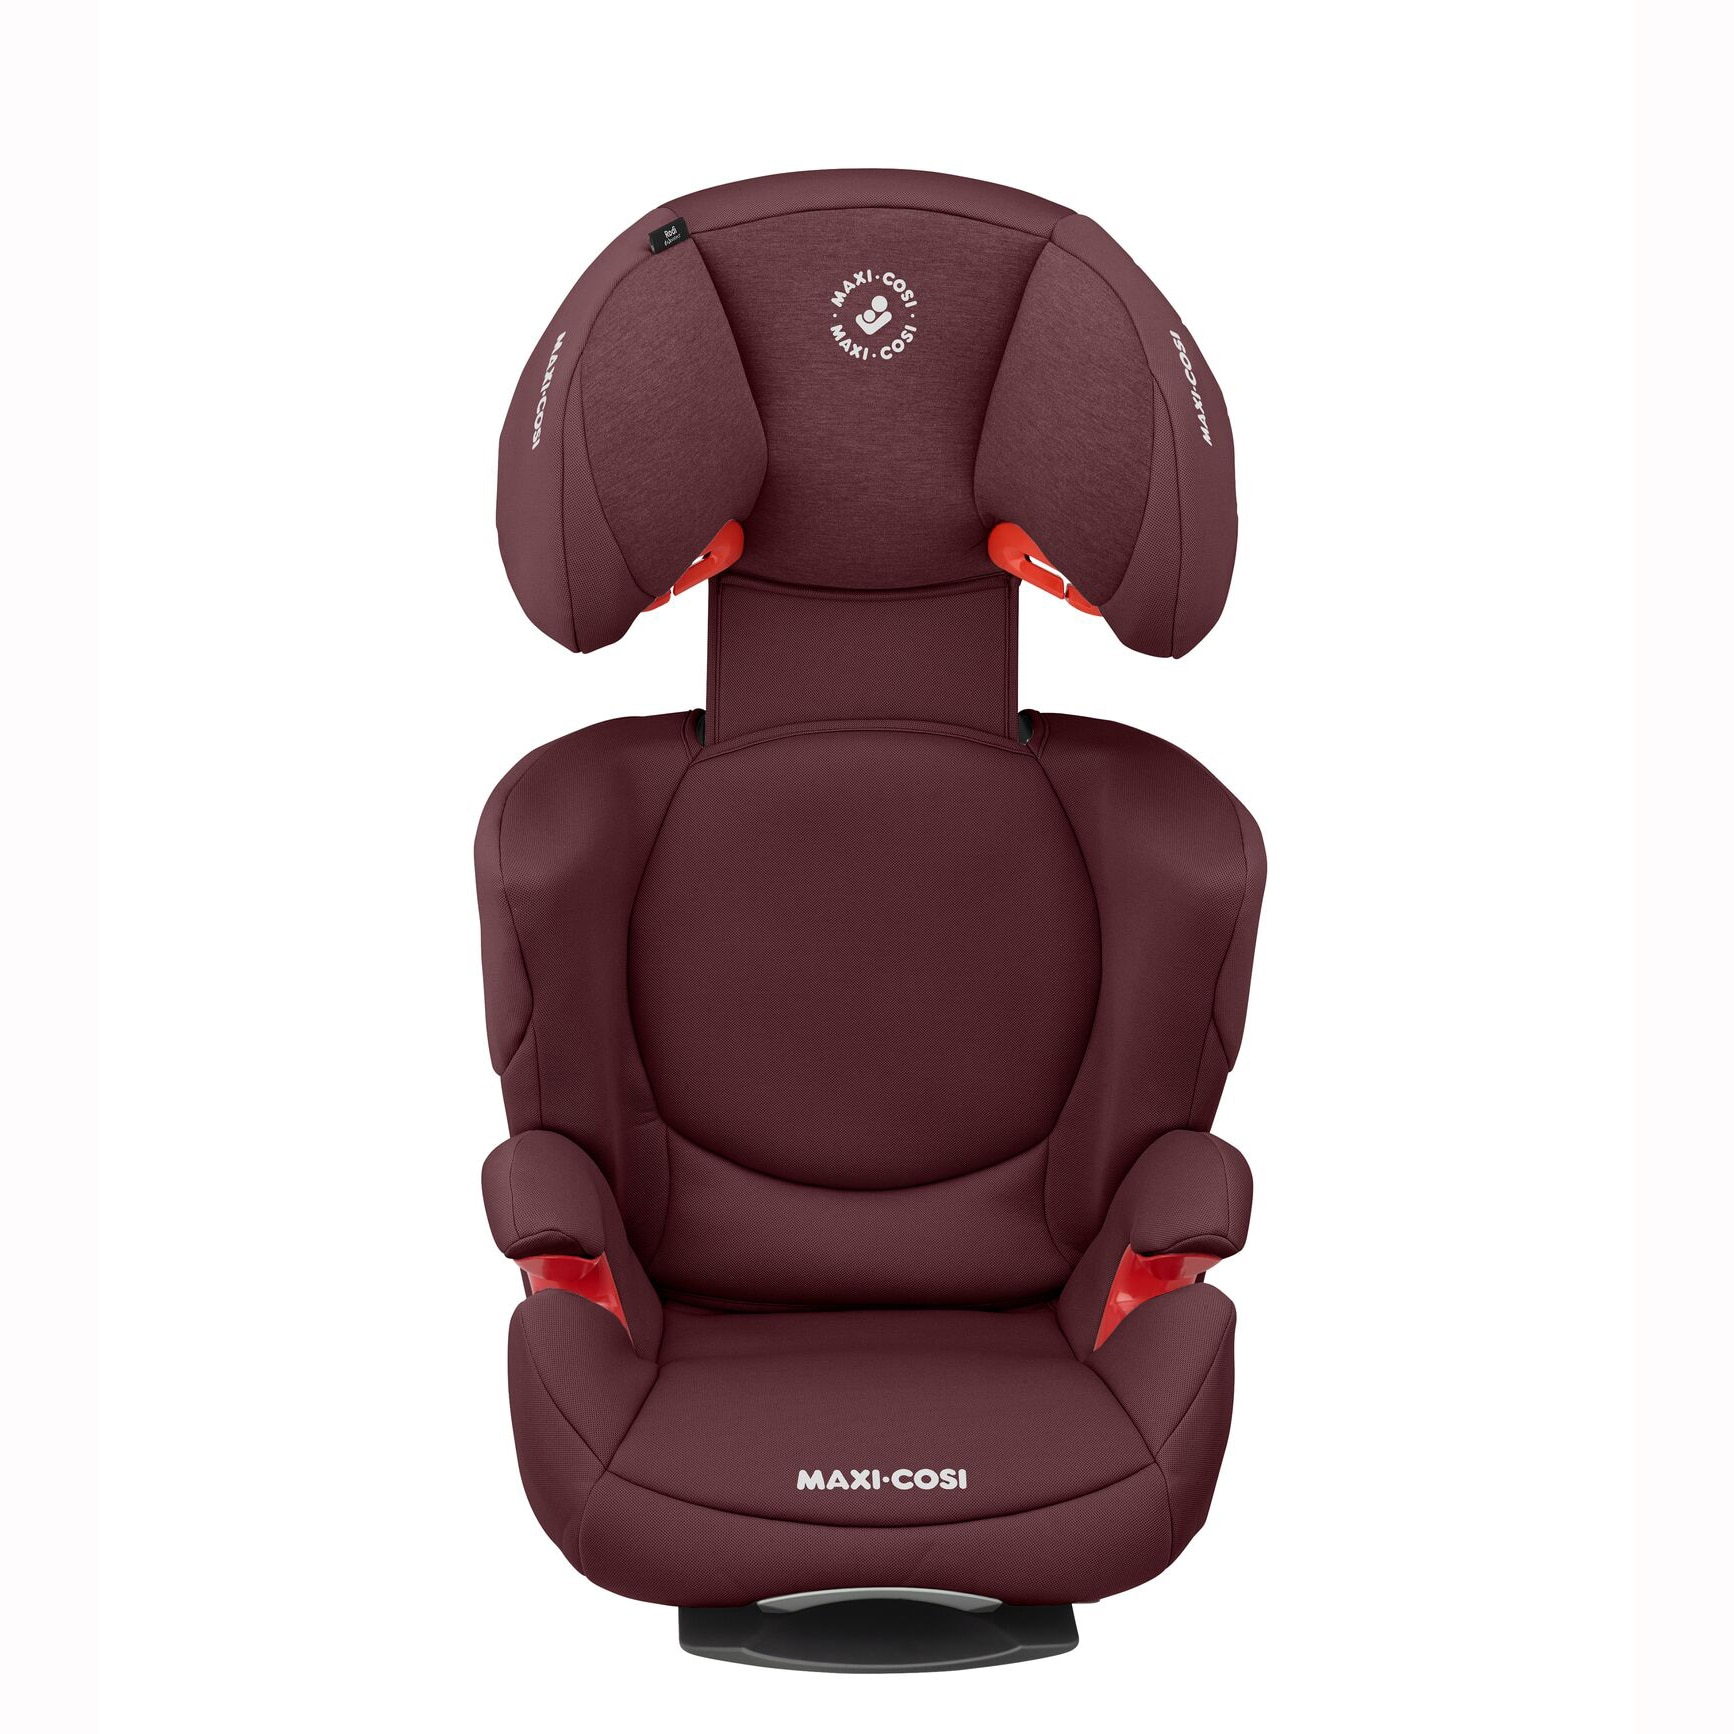 Fotografie Scaun auto Maxi Cosi Rodi Air Protect, Authentic Red, 15-36 kg, Rosu